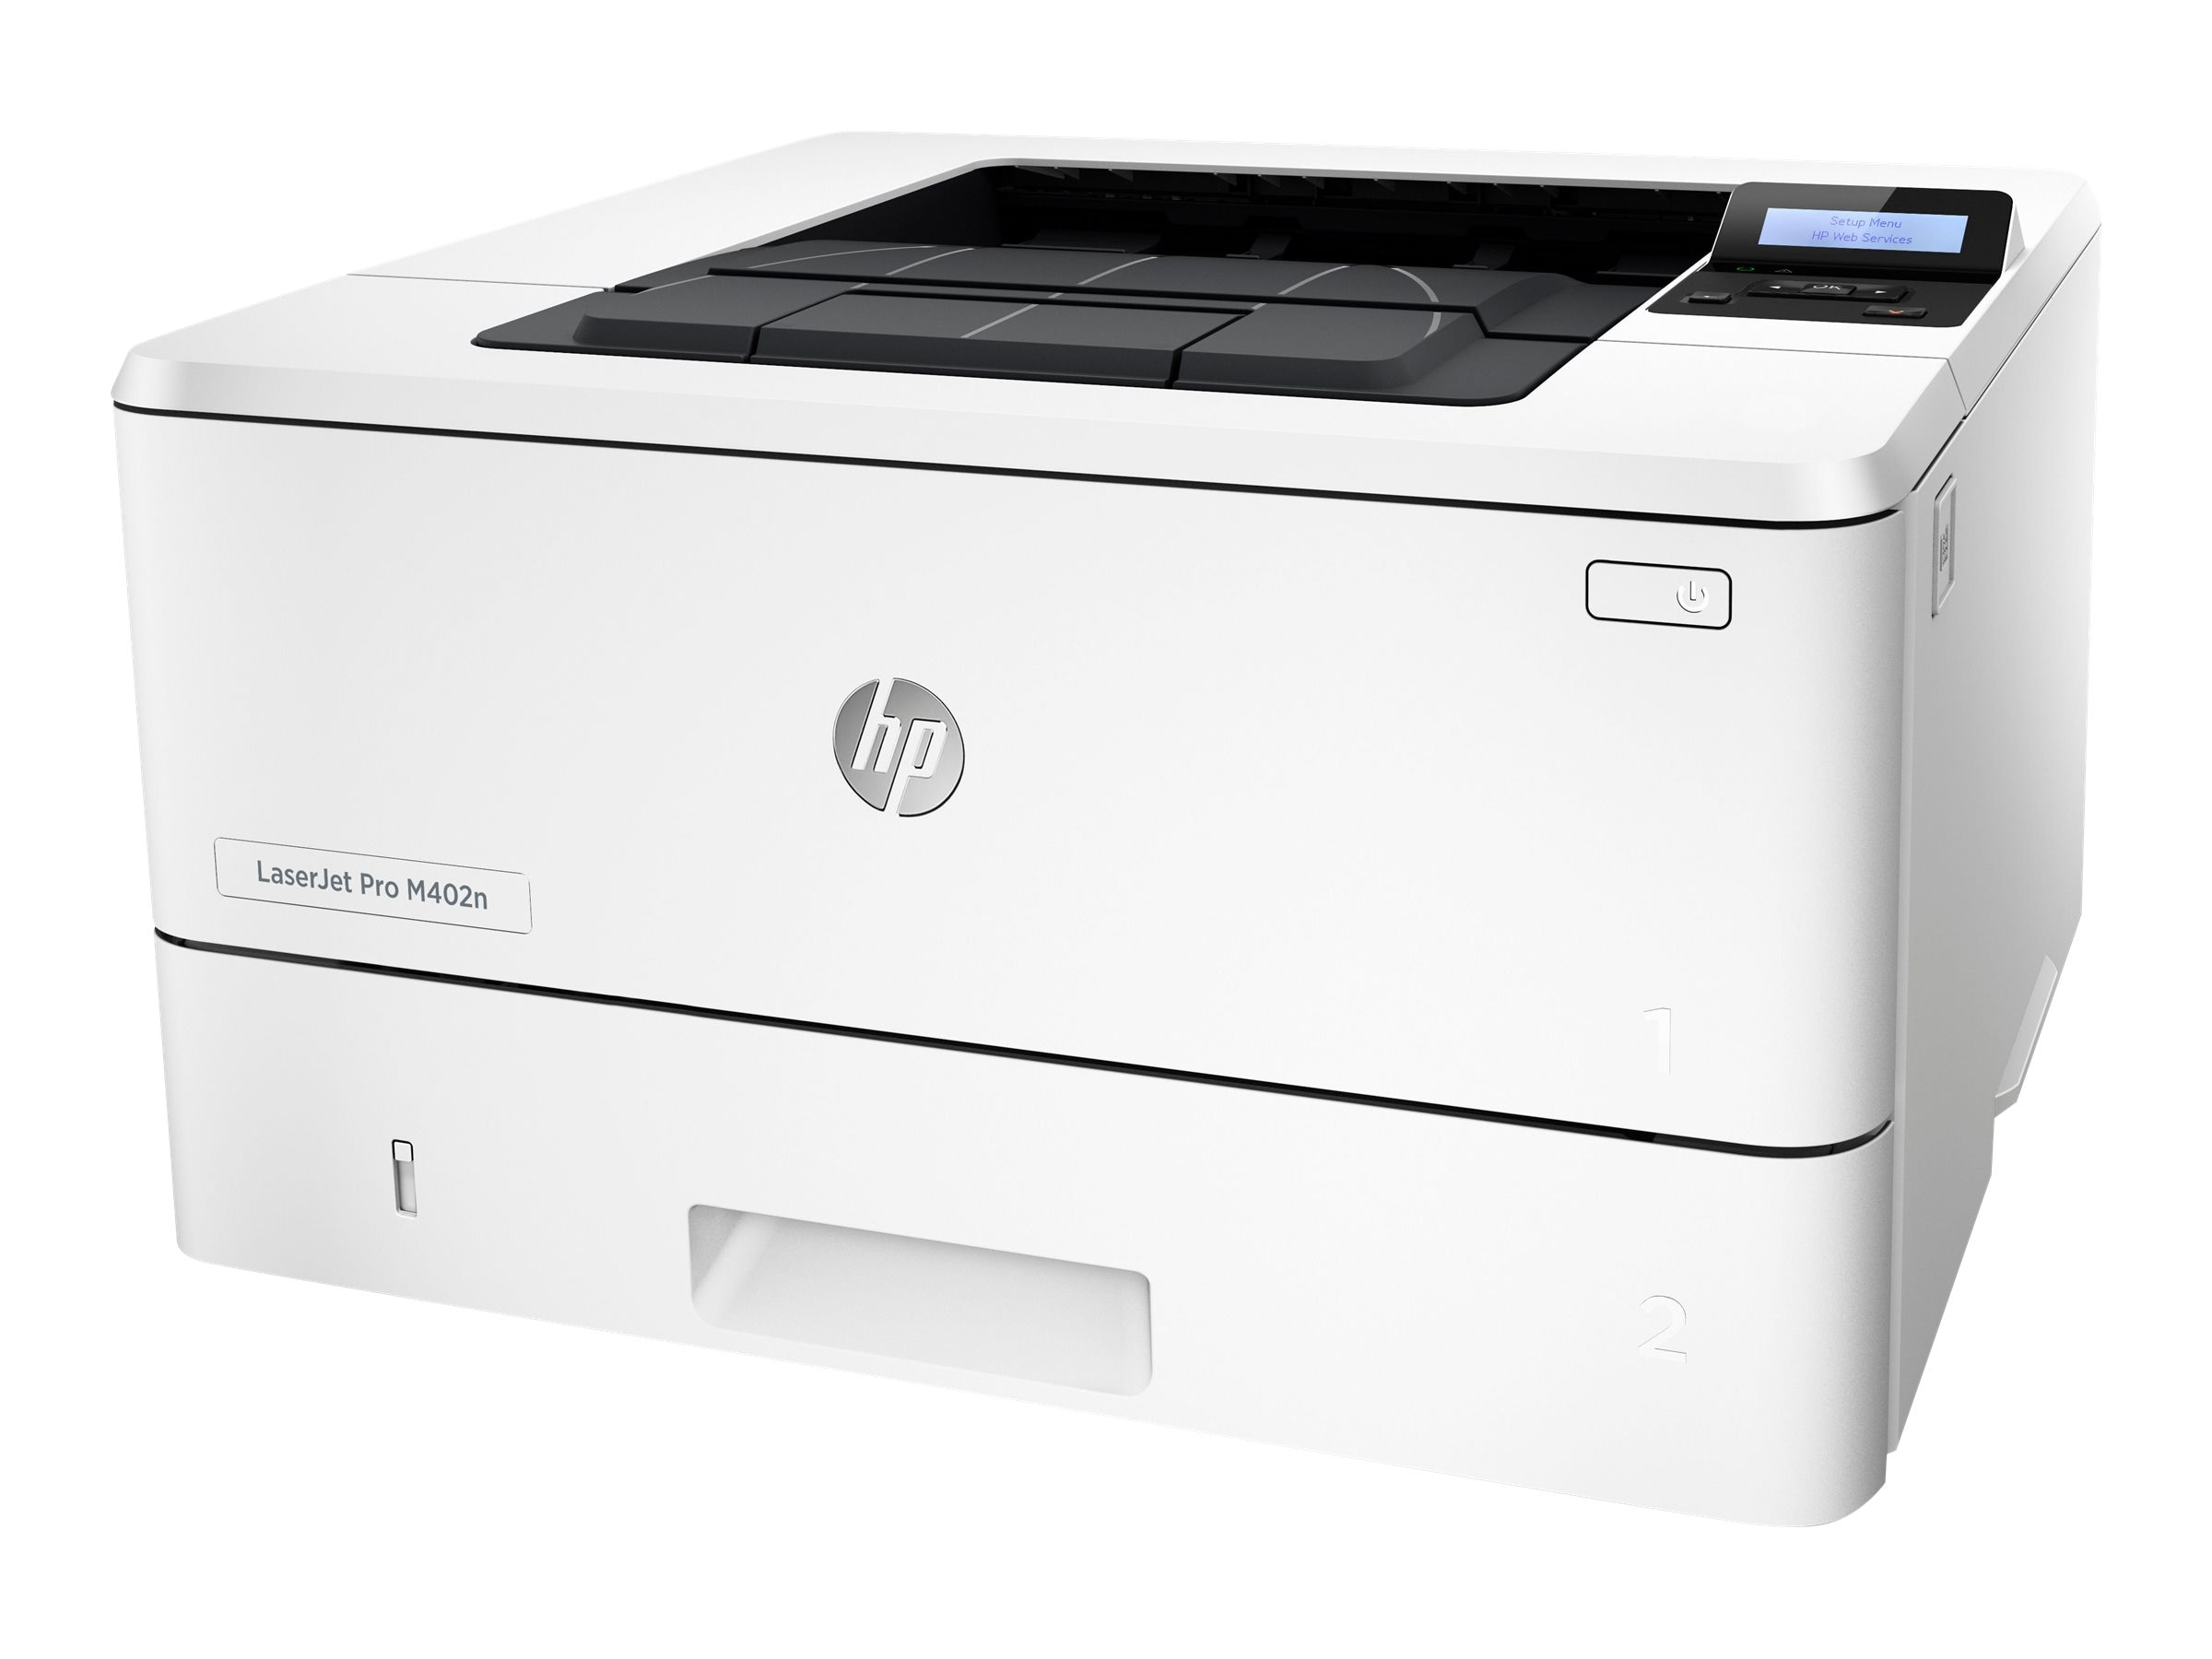 HP LaserJet Pro 400 M402n Printer ($269.00-$80.00 Instant Rebate = $189.00. Expires 3 30), C5F93A#BGJ, 30006358, Printers - Laser & LED (monochrome)